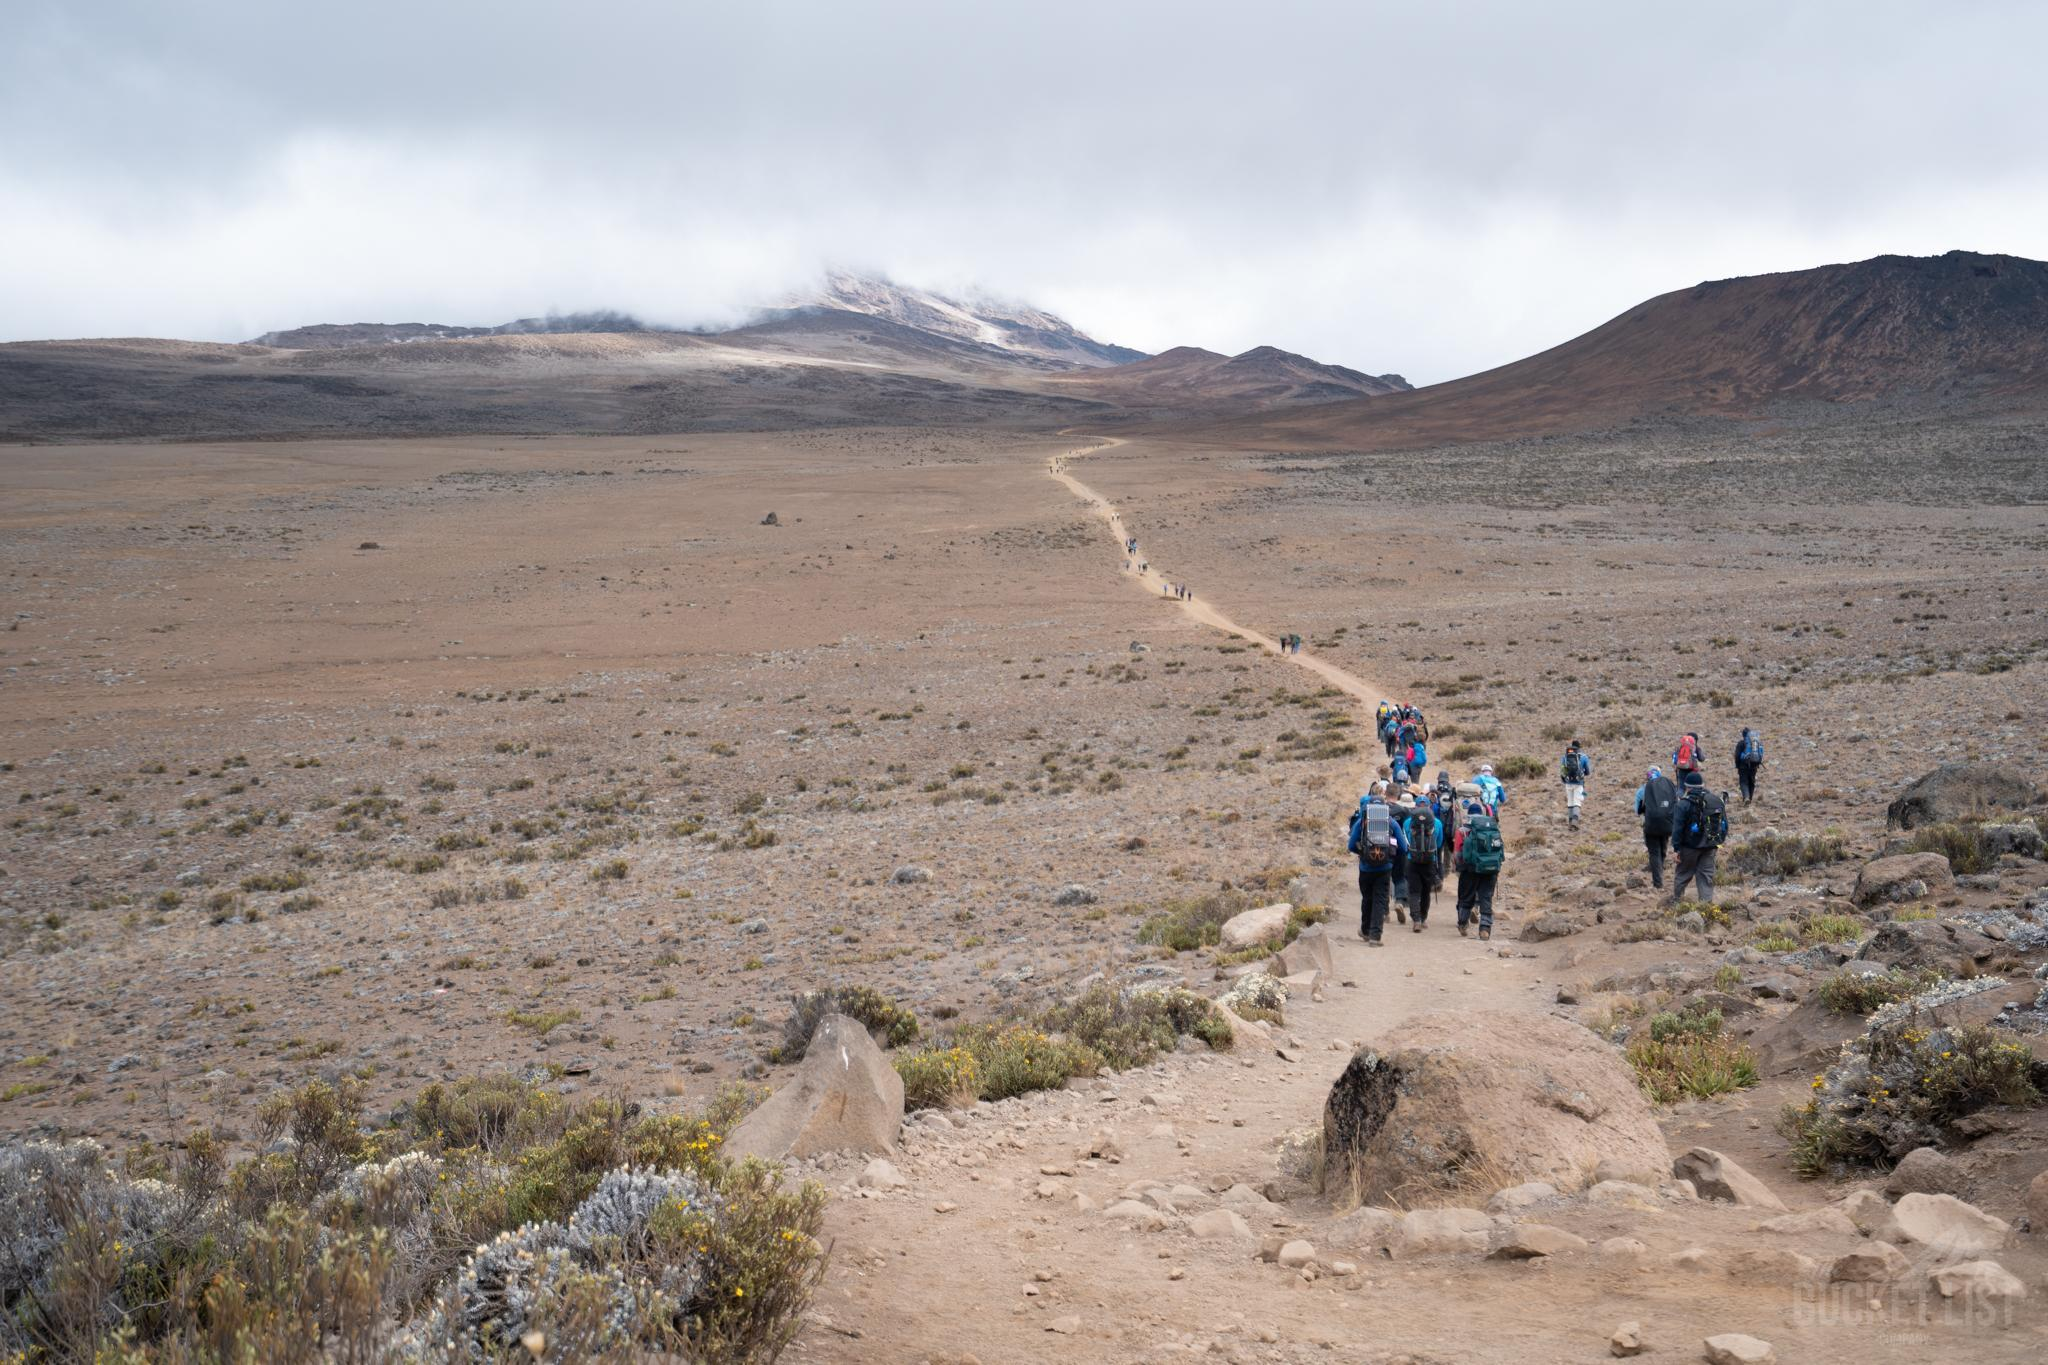 A group trekking towards Kilimanjaro